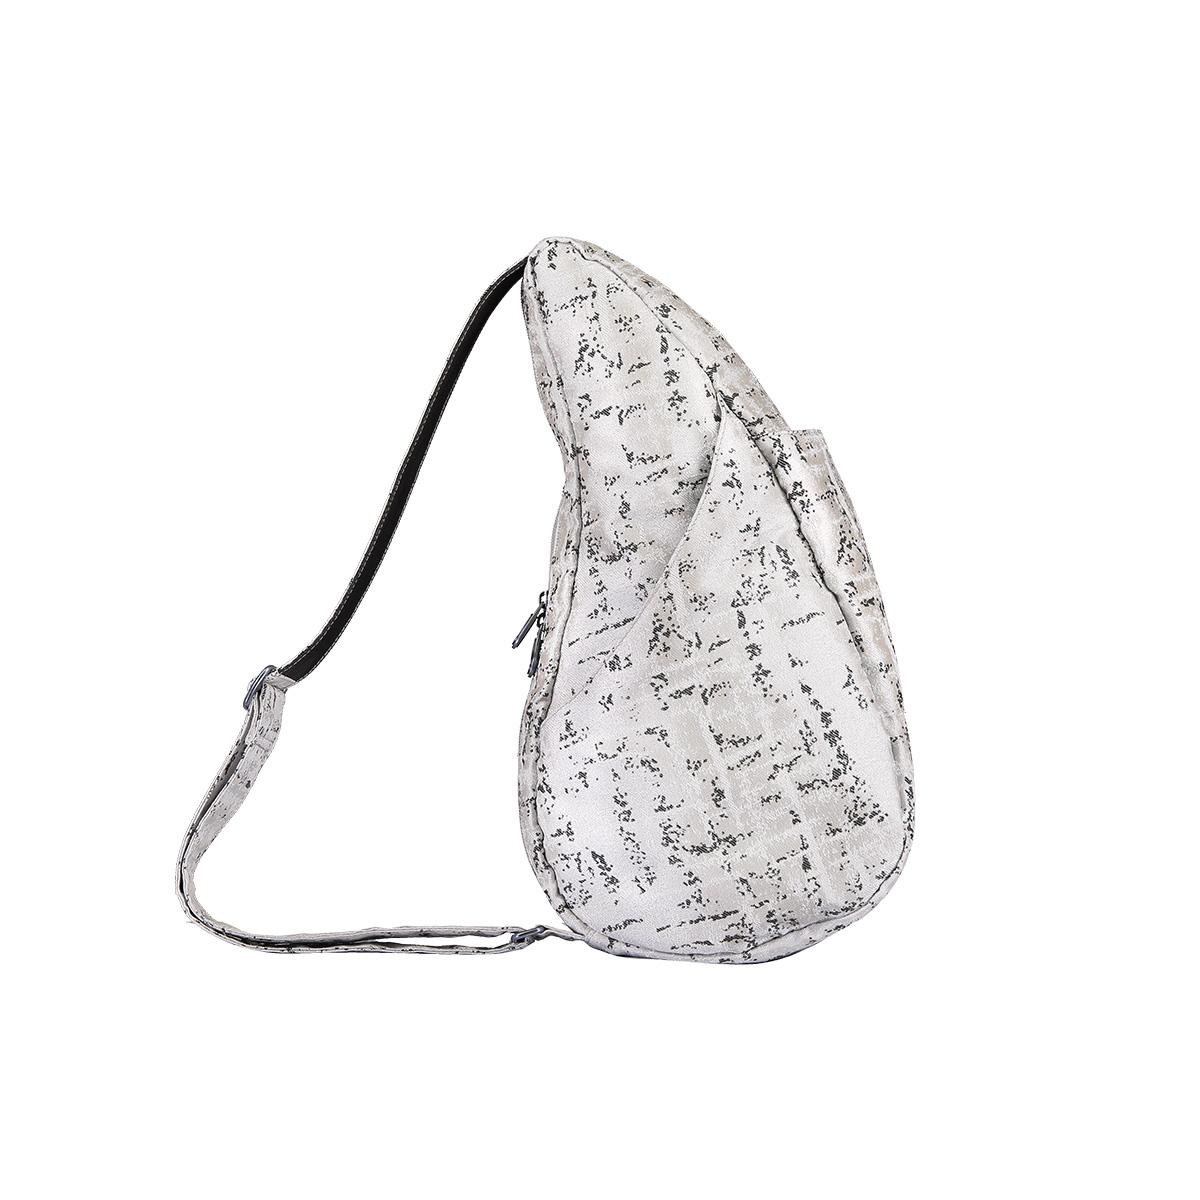 Healthy Back Bag/ヘルシーバックバッグ/ショルダーバッグ/ボディバッグ/旅行バッグ/軽量/レディース/メンズ 《限定ポーチ付》 公式ストア ヘルシーバックバッグ アイスグレイズ Sサイズ